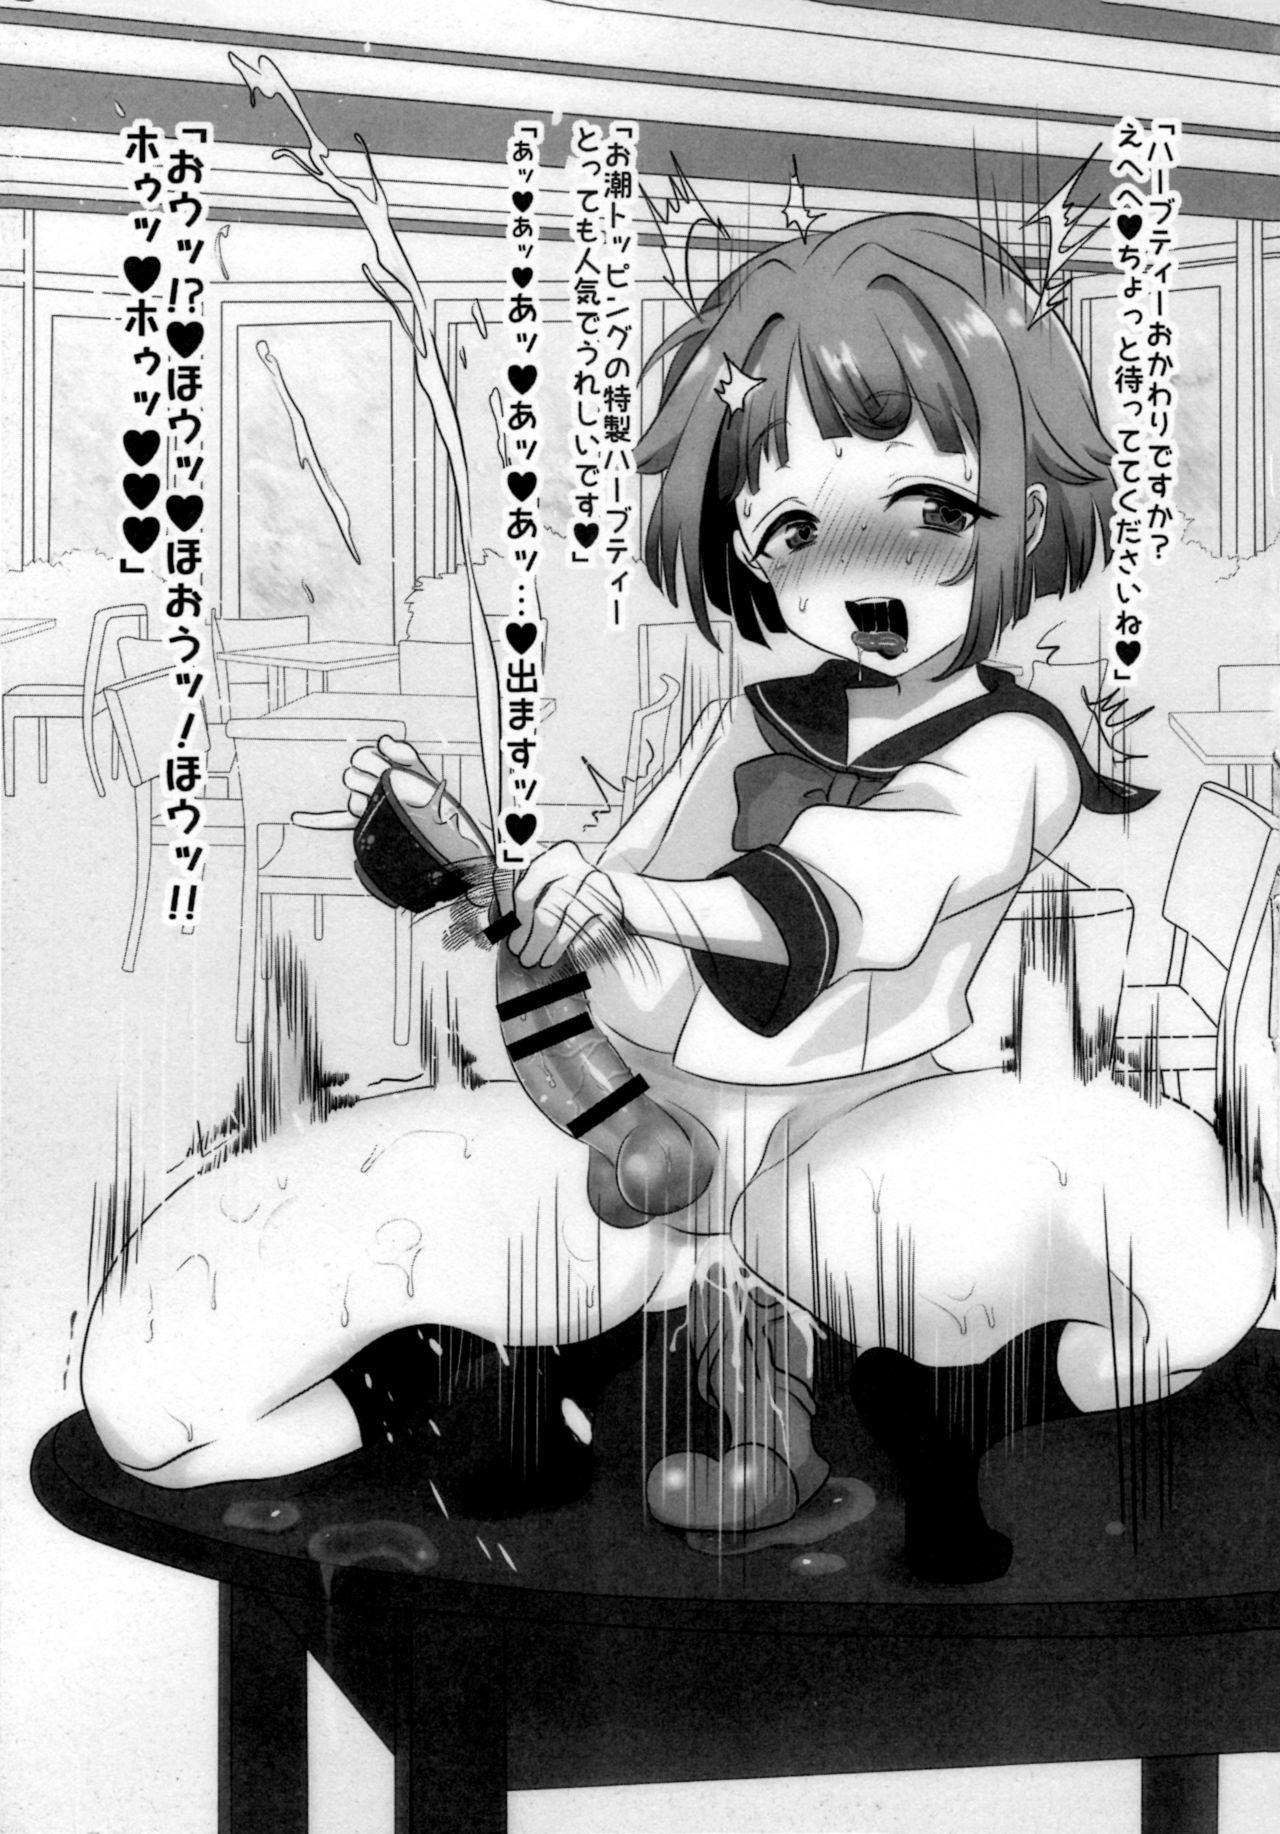 Yumenosaki Matomete Minna Saimin Kan 3